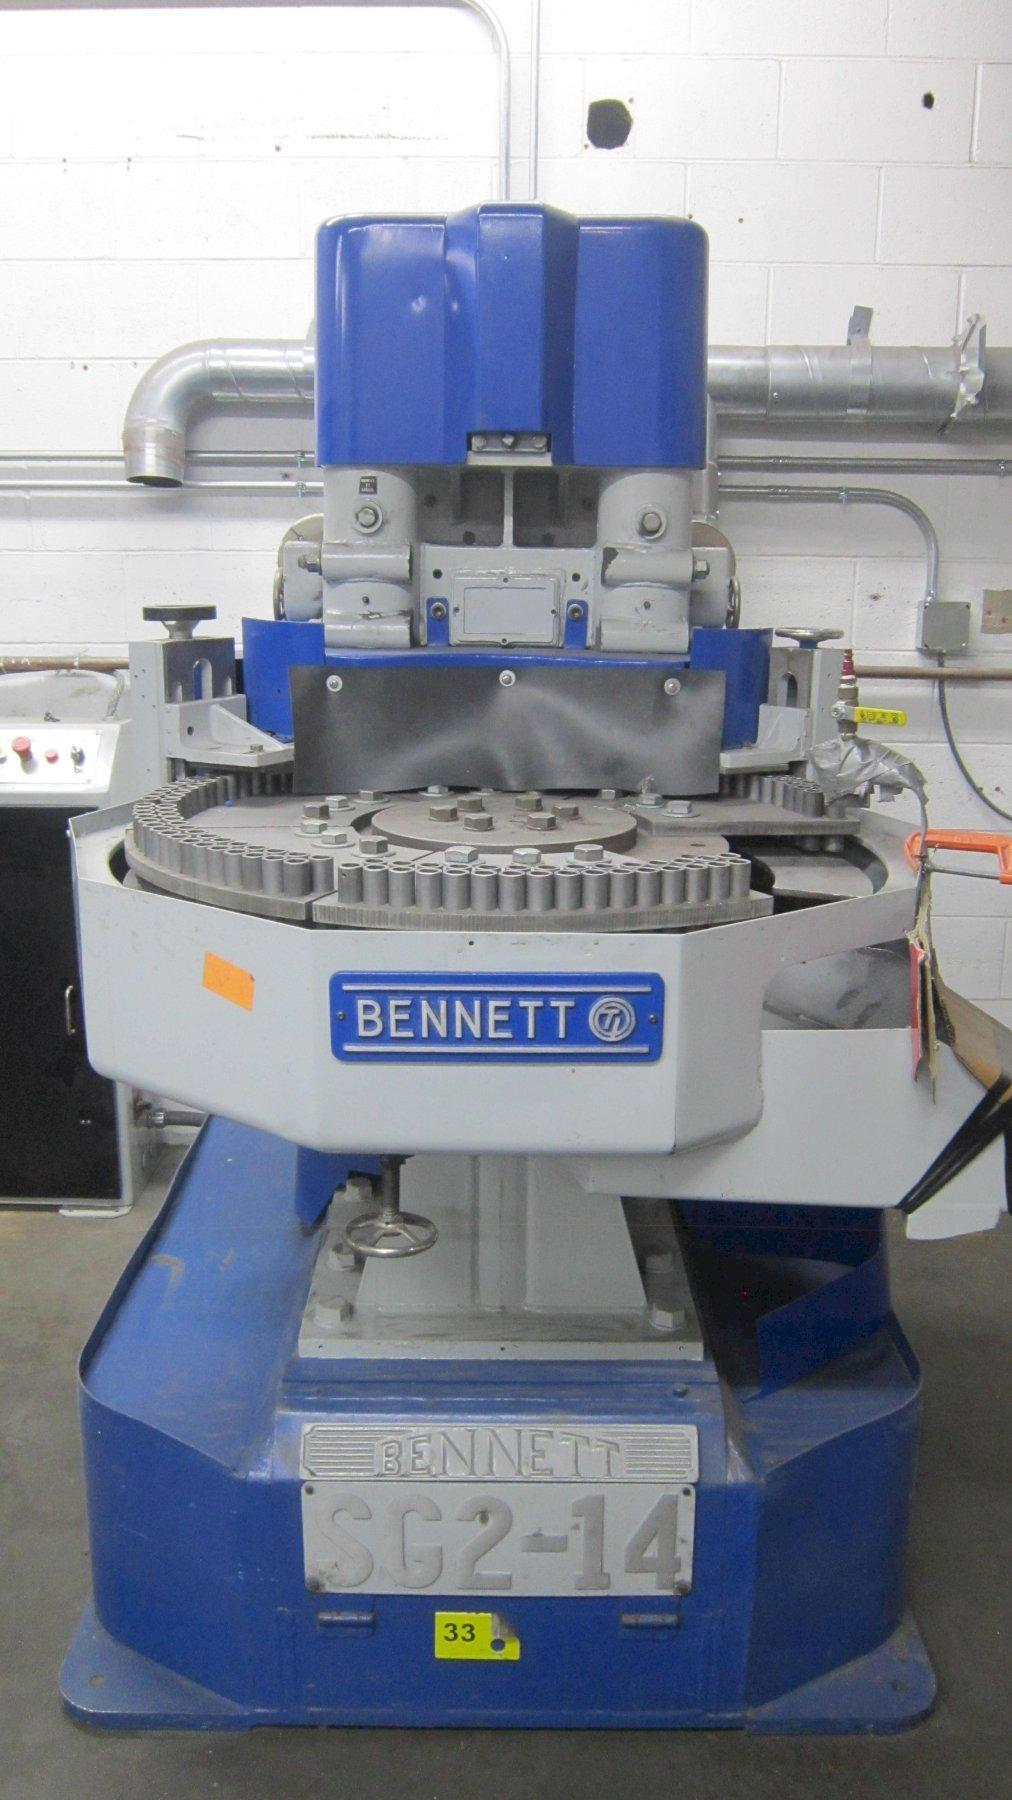 Bennett SG2-14 Dual Head Spring Grinder